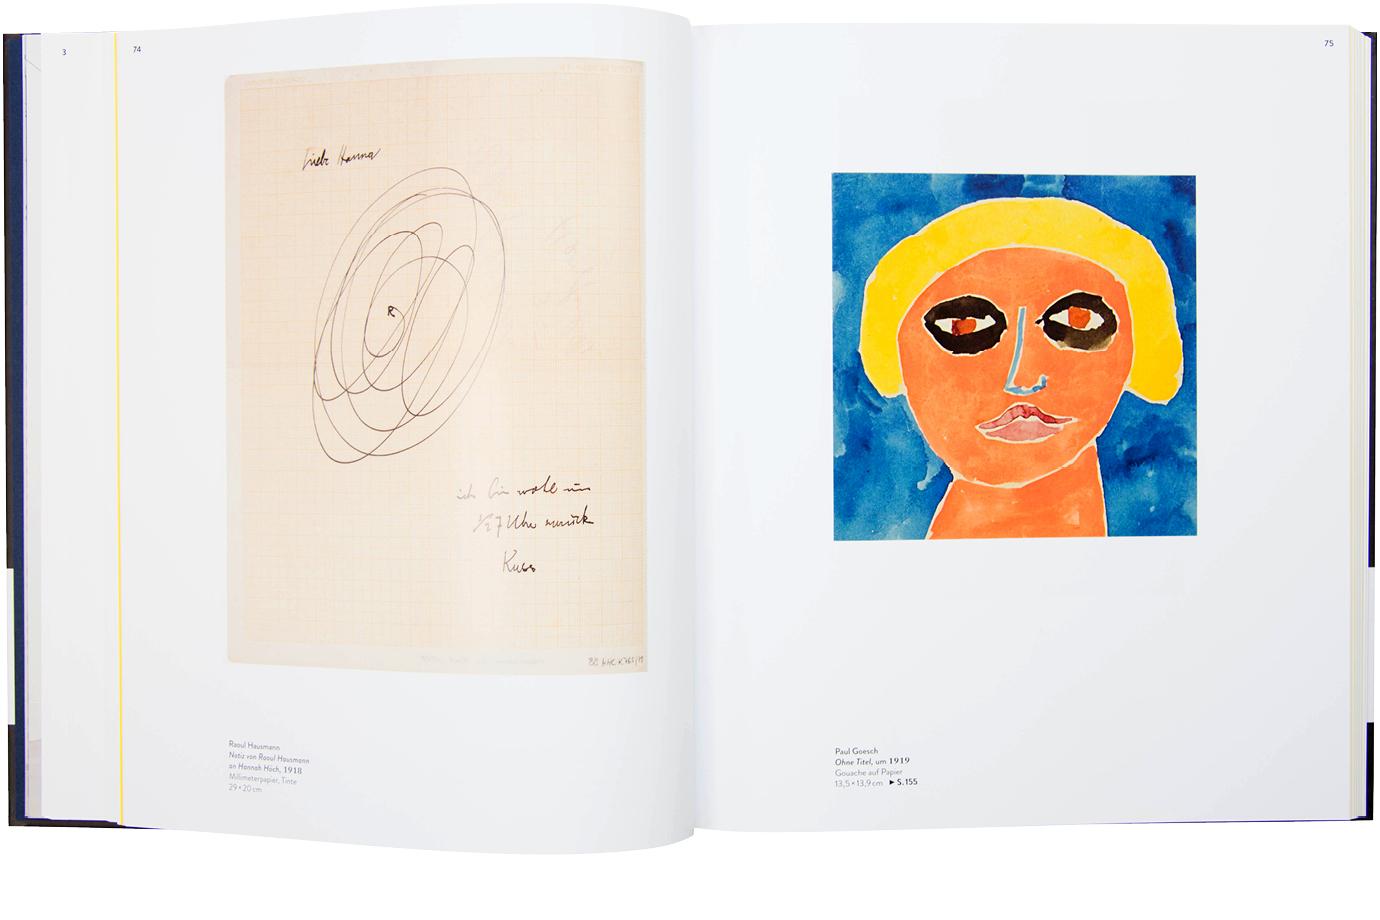 http://e-o-t.de/wordpress/wp-content/uploads/2017/06/2015_eot-BG-Jubilaeum-Book-9.jpg